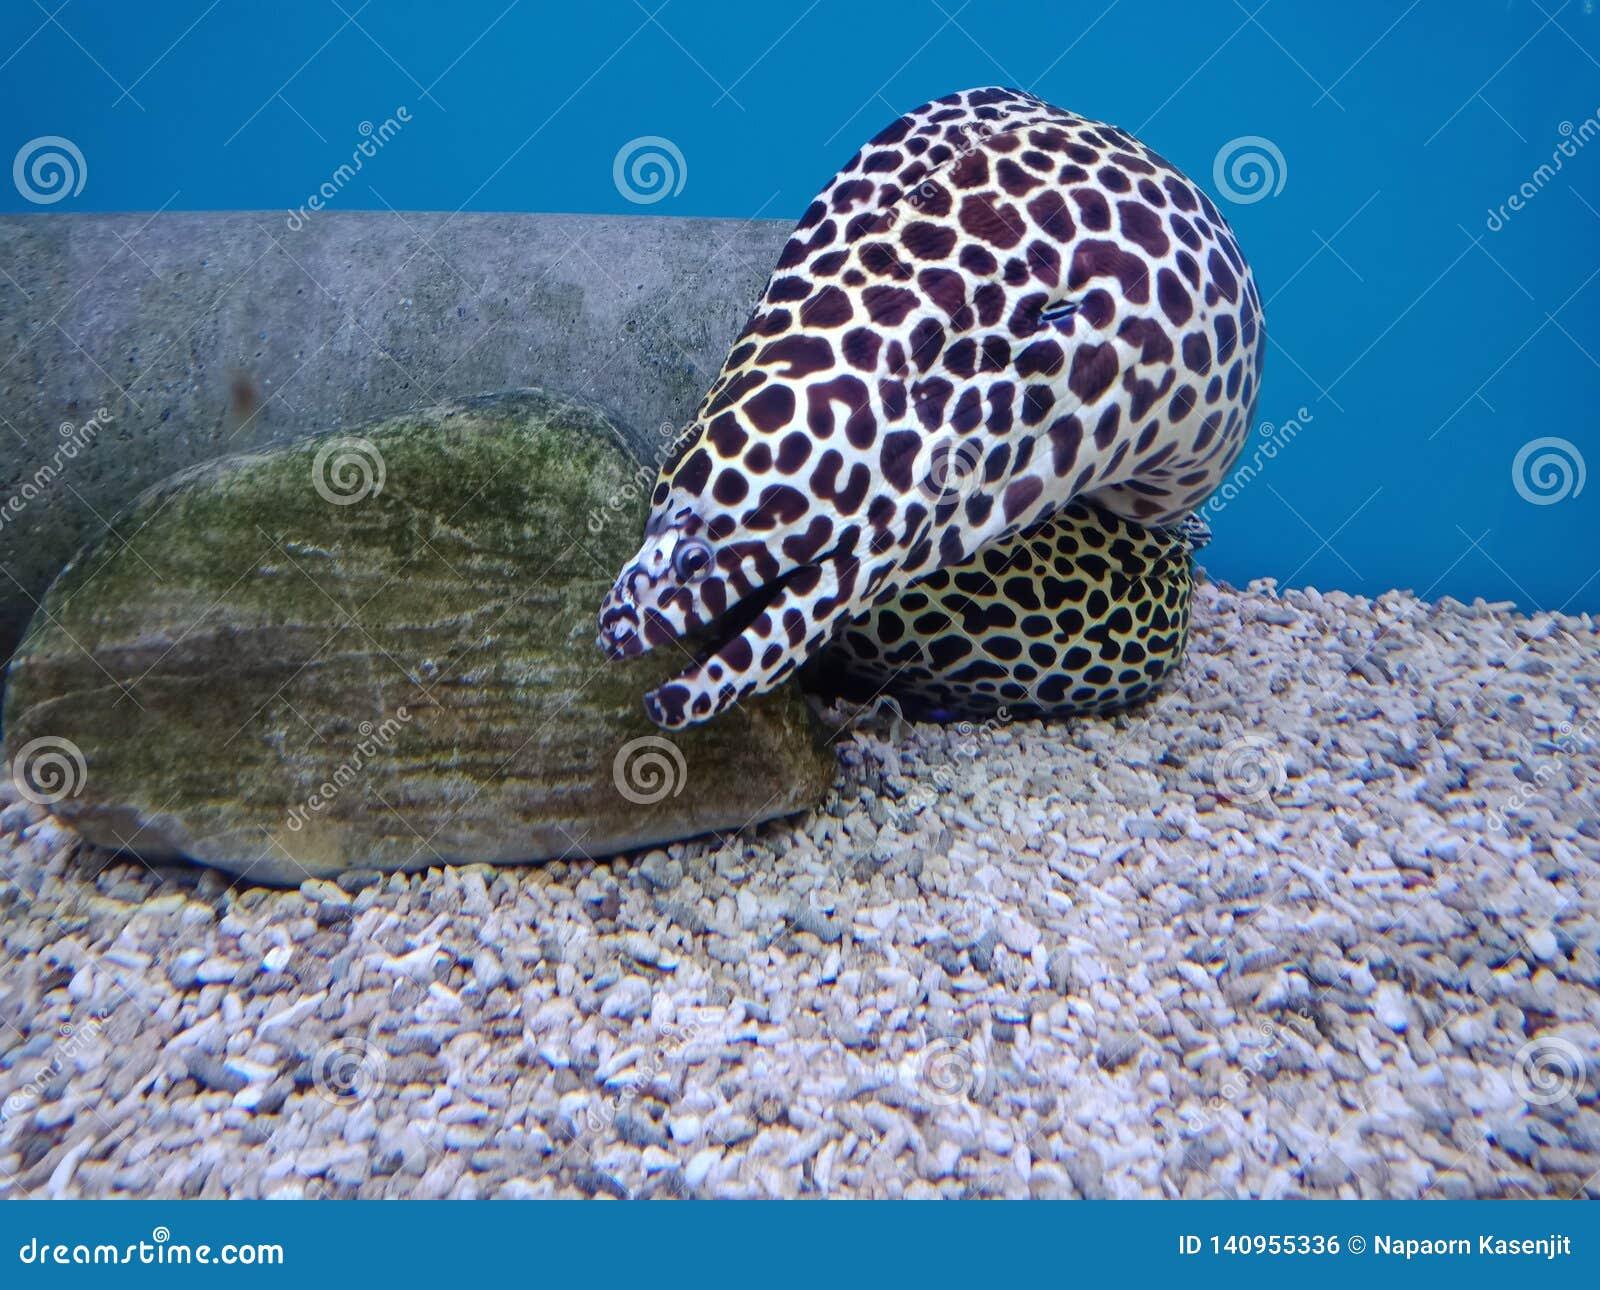 Moray Eels , Like A Snake Body Length Editorial Photo - Image of face,  helianthus: 140955336